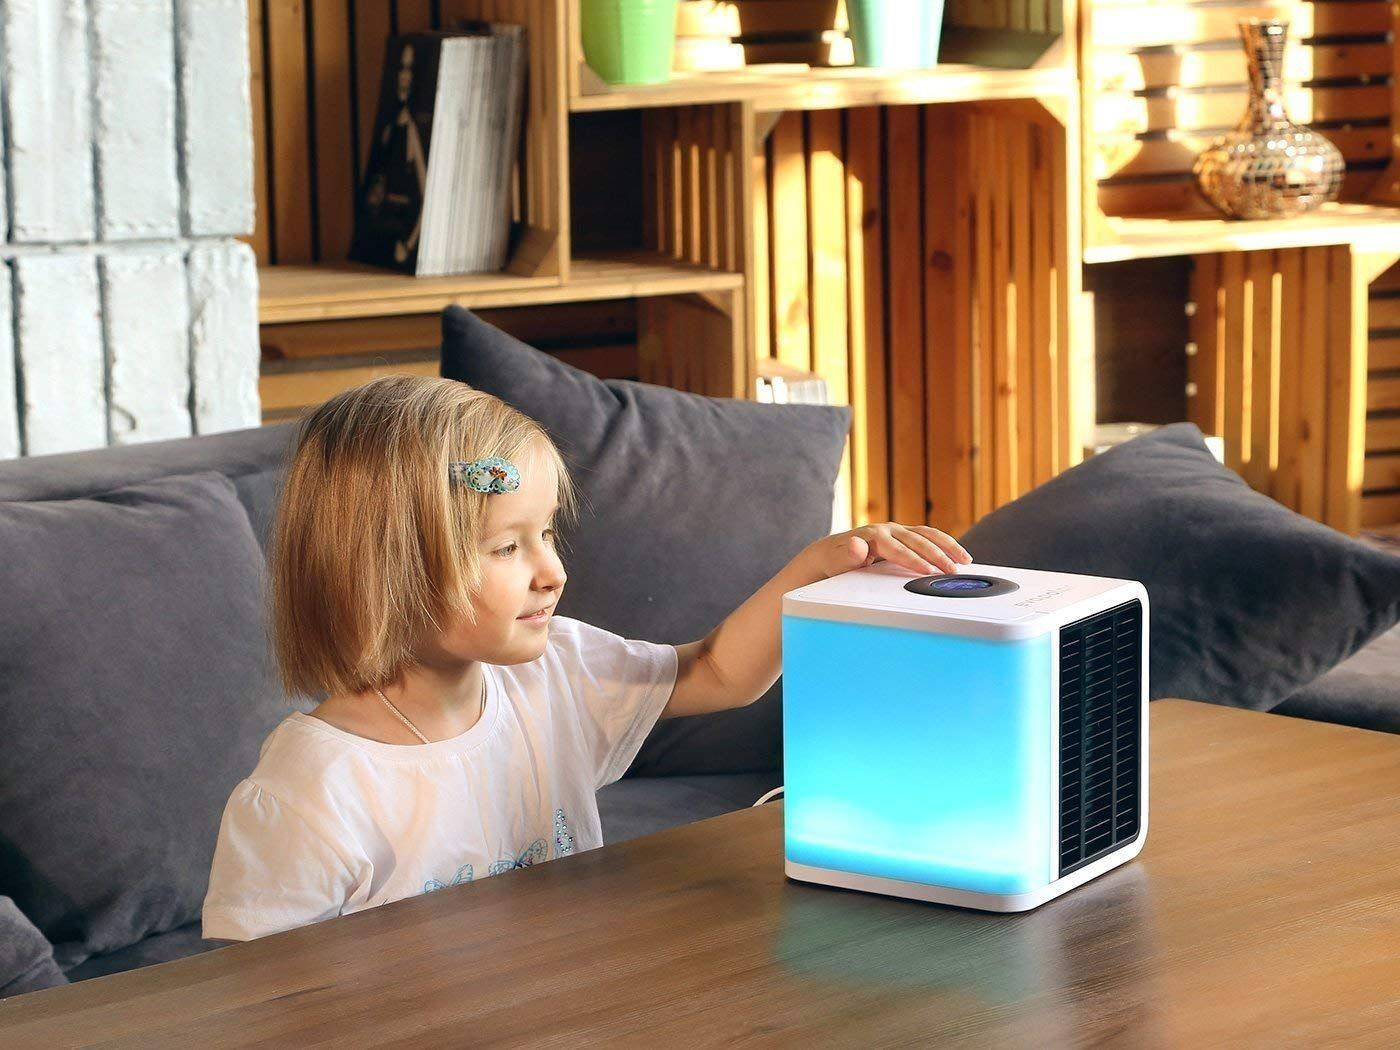 Portable Personal Air Cooler Portable cooler, Air cooler